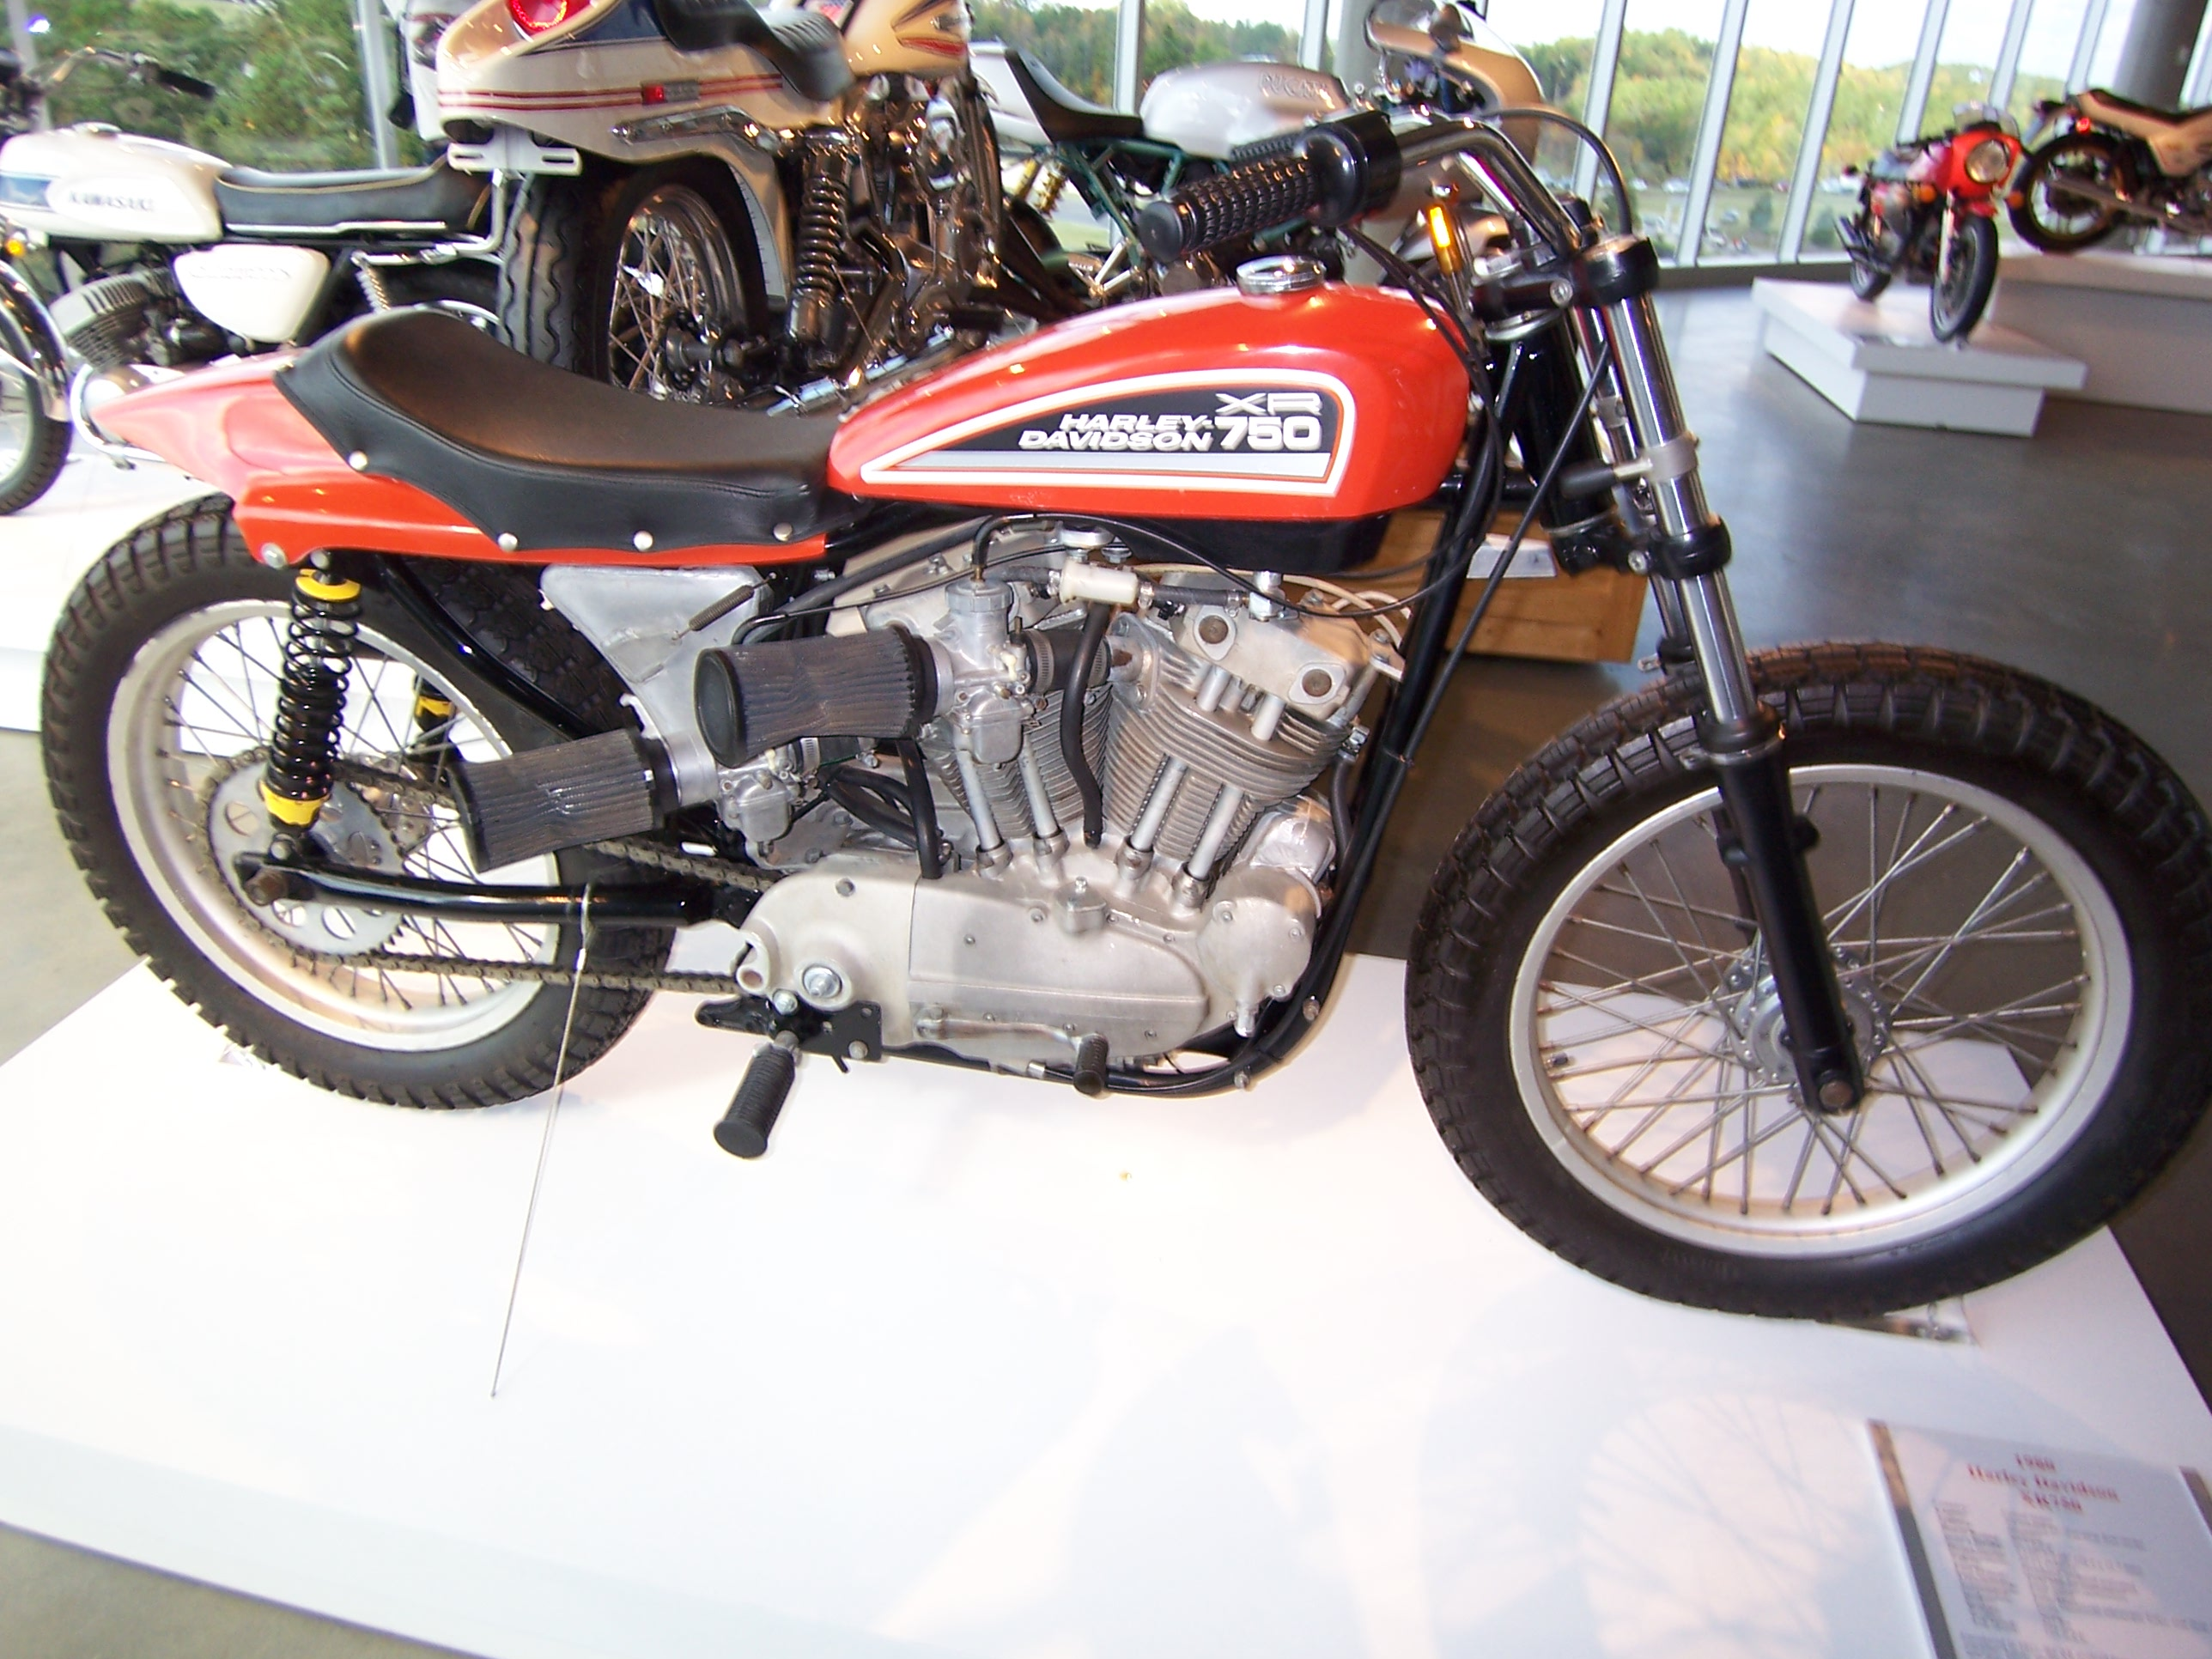 The Harley Davidson Xr 750: File:1980 Harley Davidson XR750 2.jpg